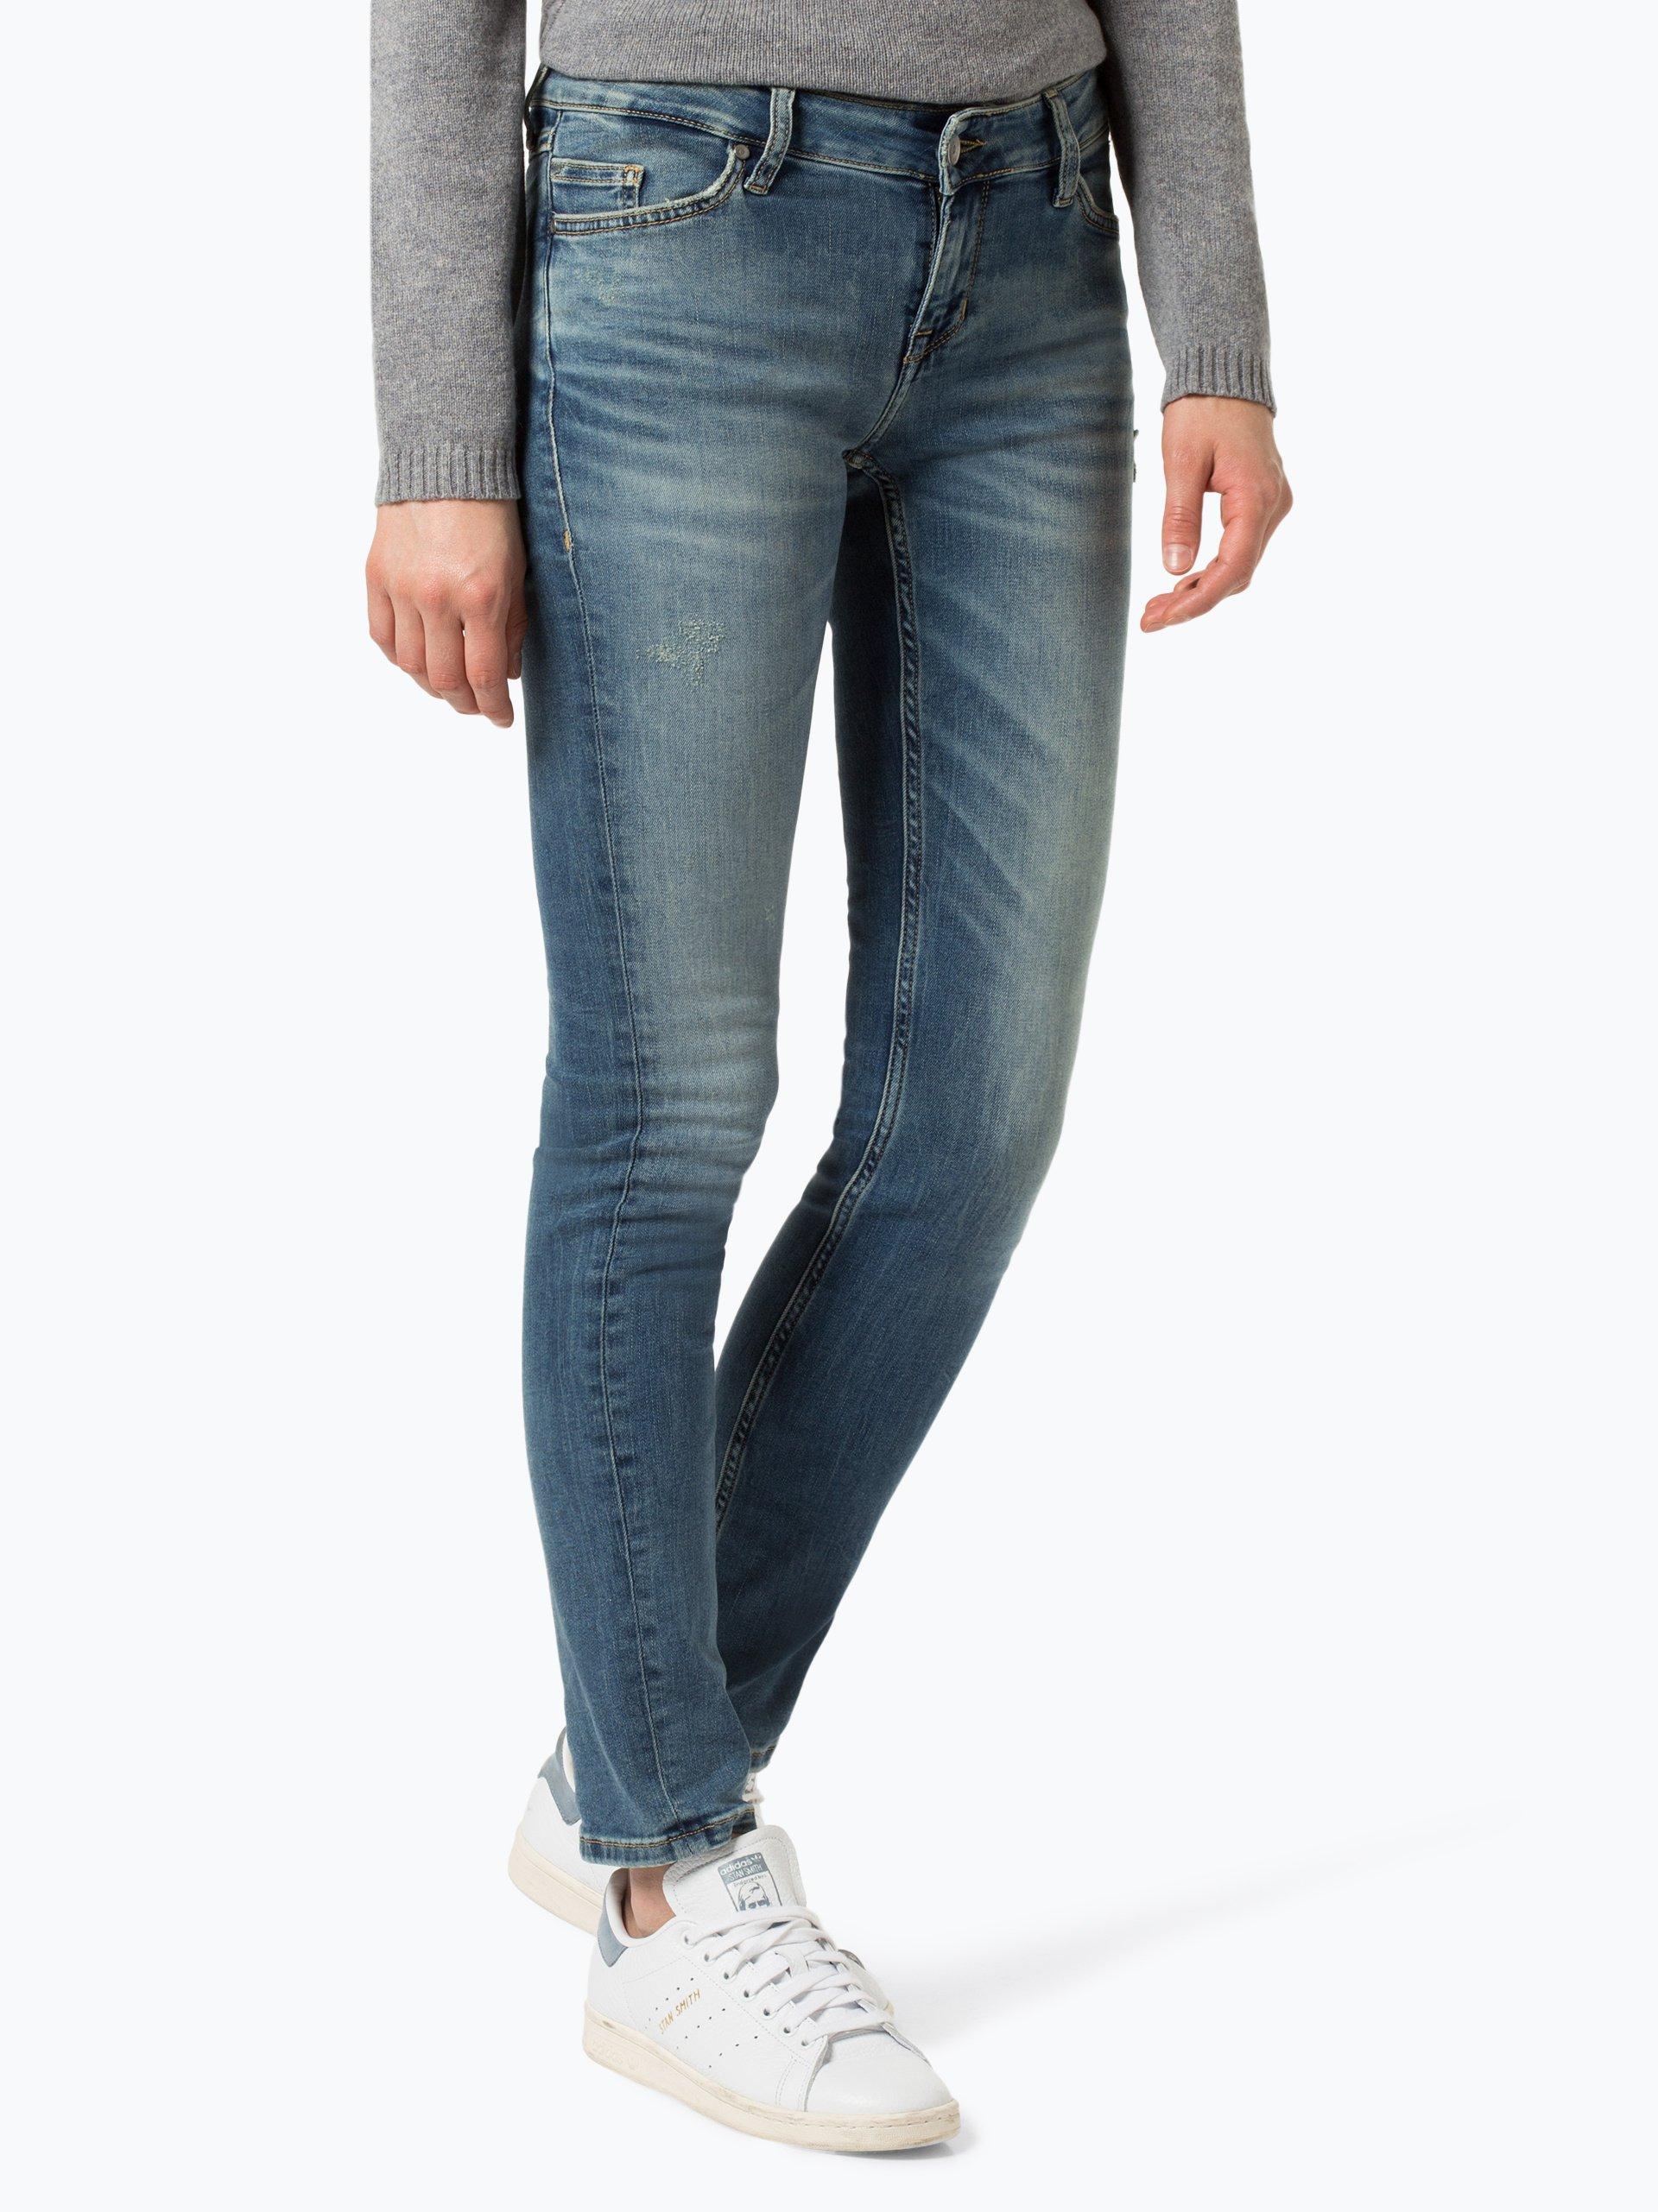 mustang damen jeans jasmin medium stone uni online kaufen peek und cloppenburg de. Black Bedroom Furniture Sets. Home Design Ideas